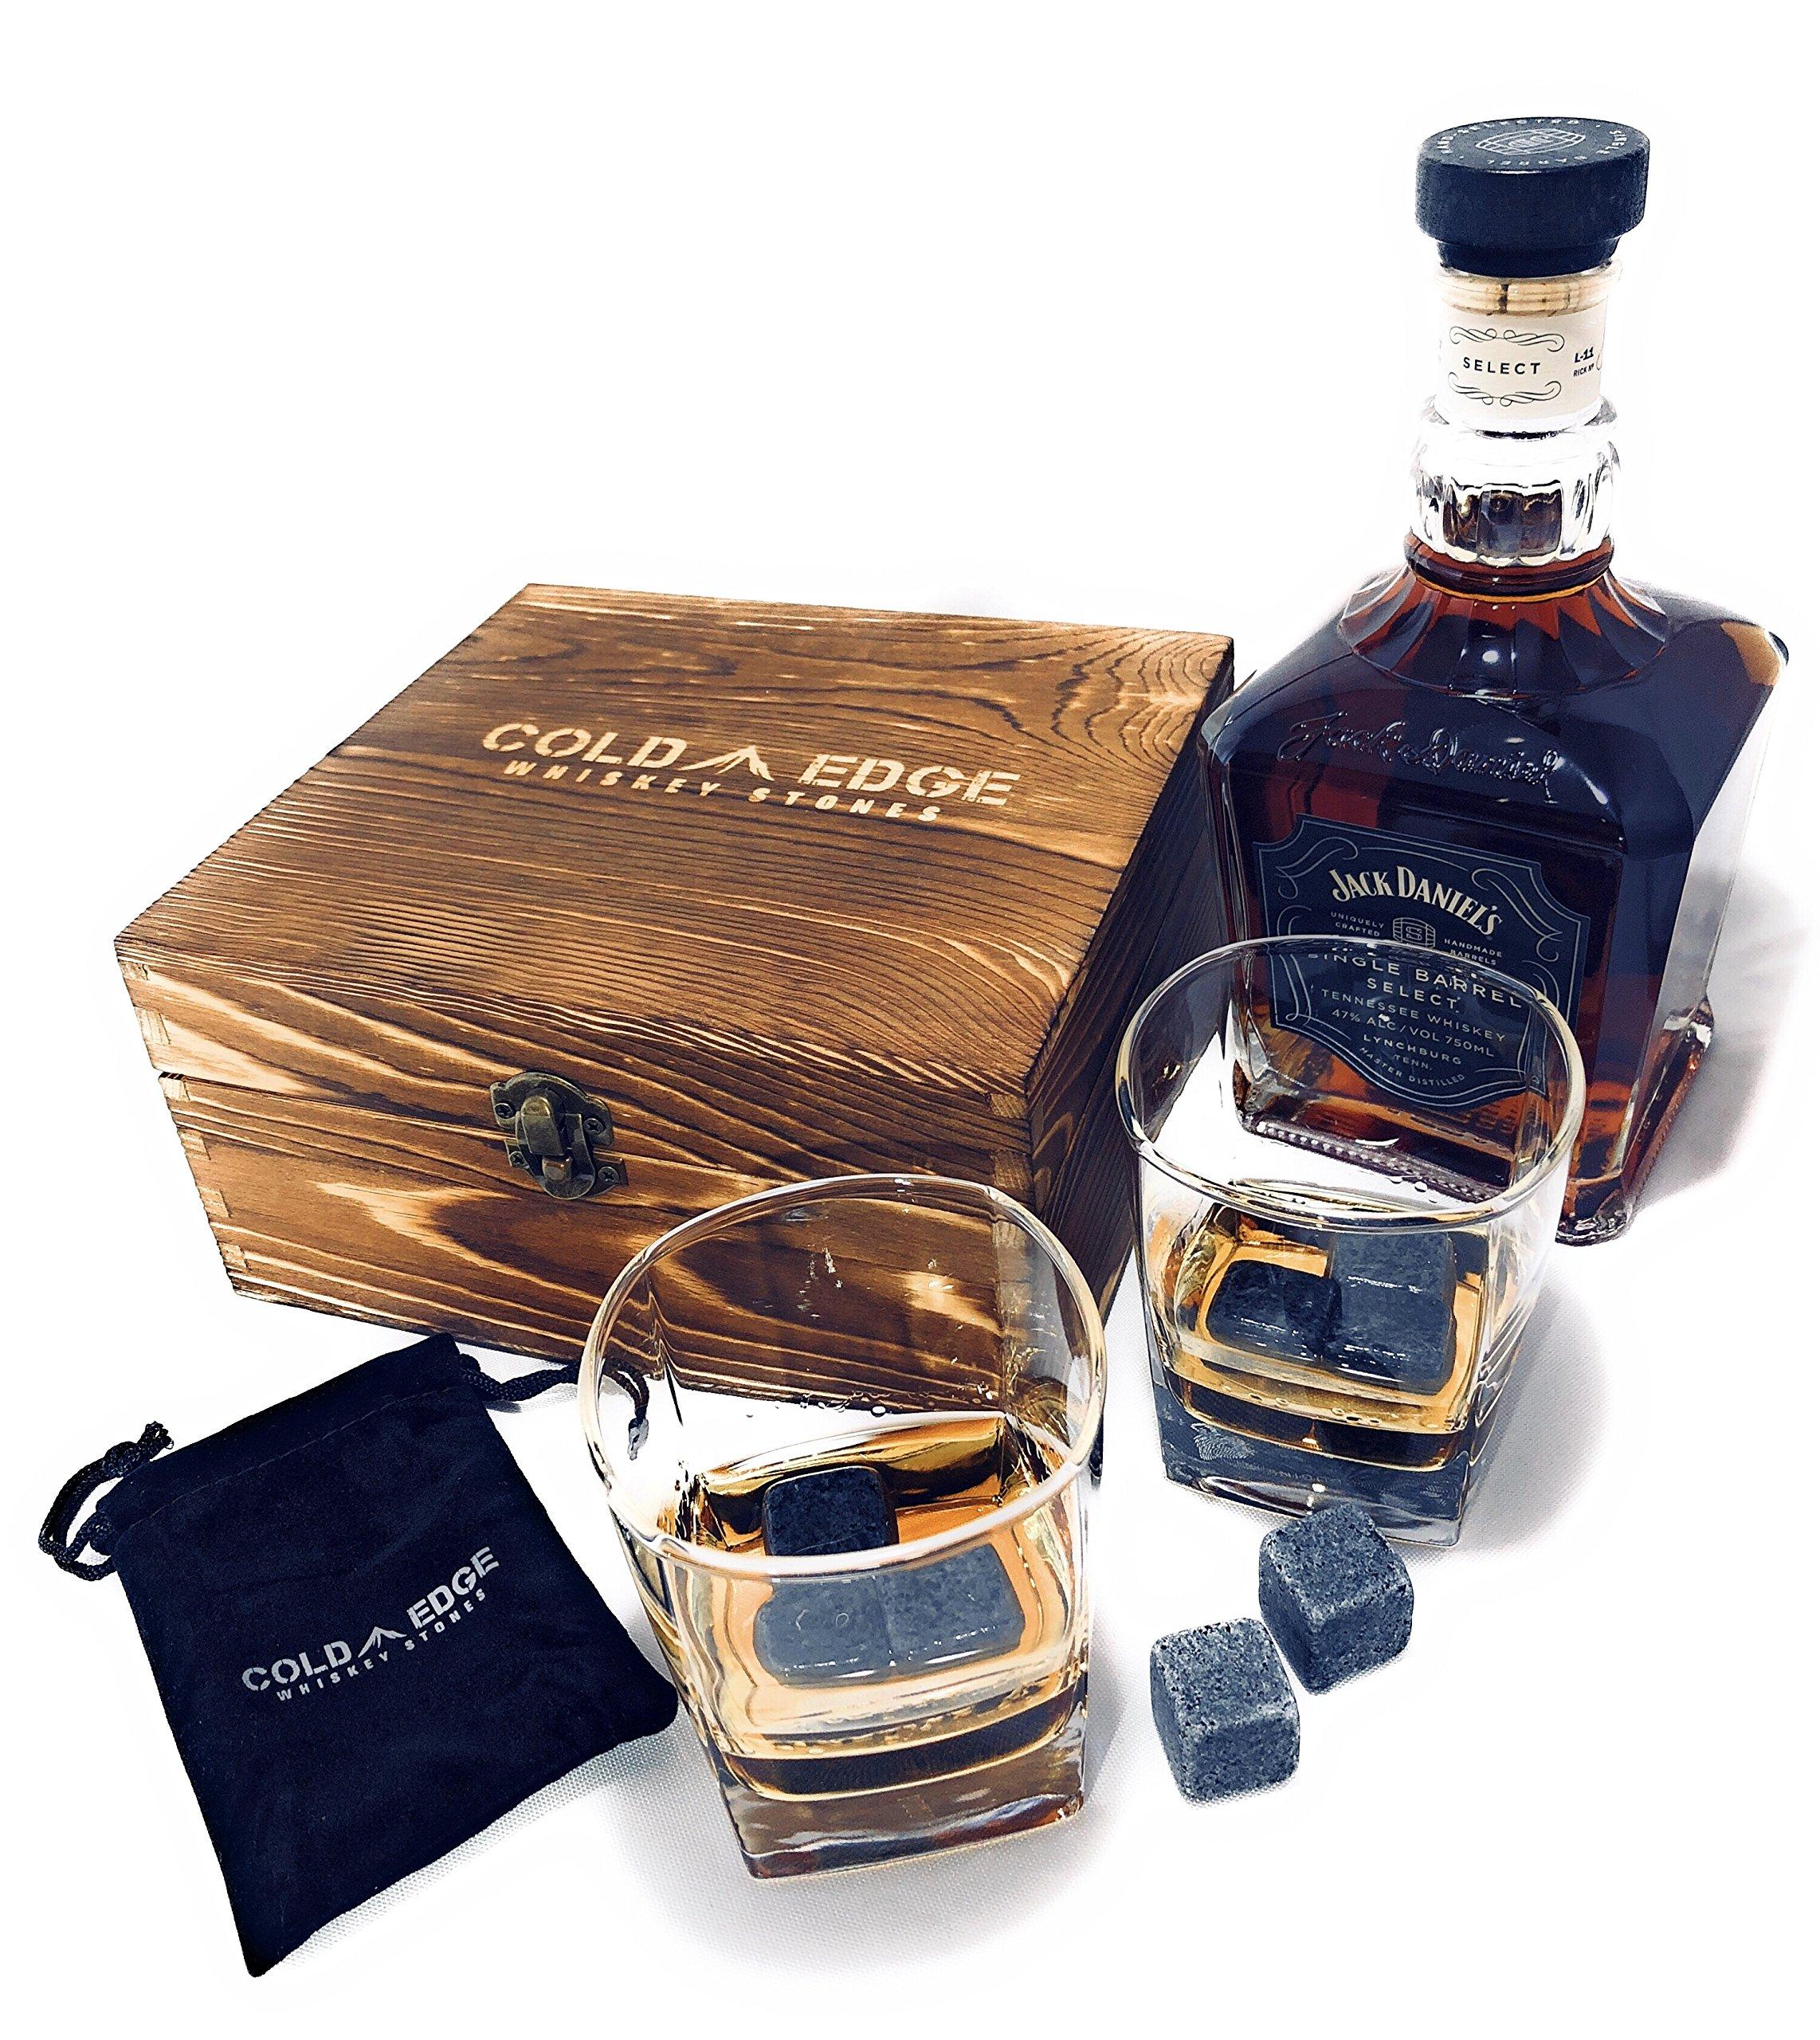 Whiskey Stones and Drinking Glasses Gift Set - 8 Granite Chilling Stones 2 Premium 9  sc 1 st  Amazon.com & Graduation Gift for Him: Amazon.com